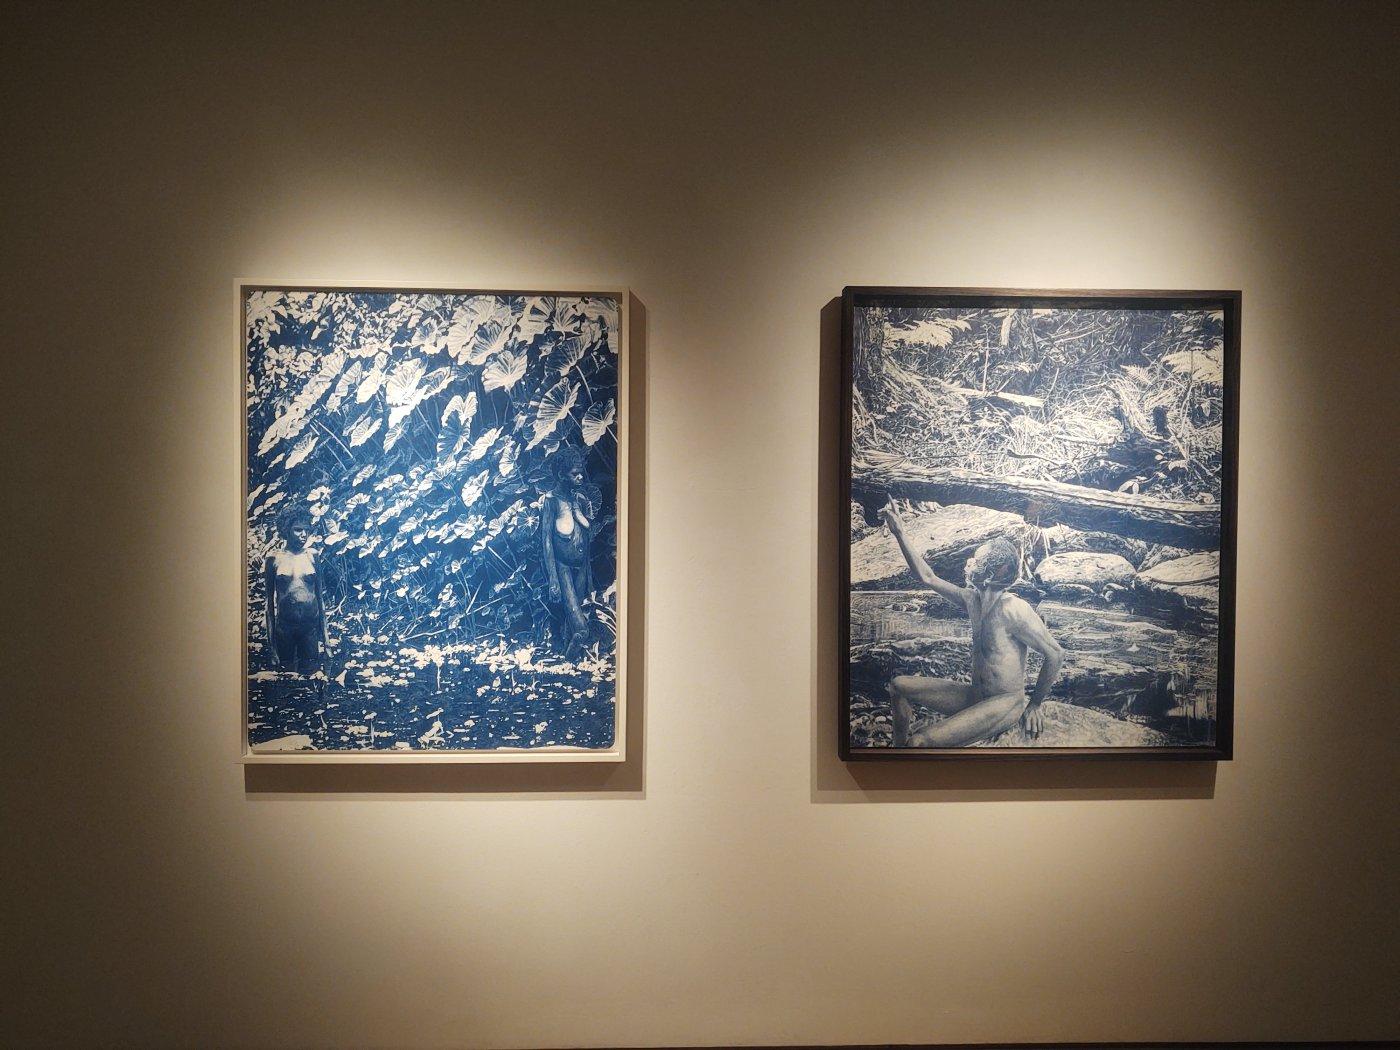 Galerie Ernst Hilger Terra Australis 4